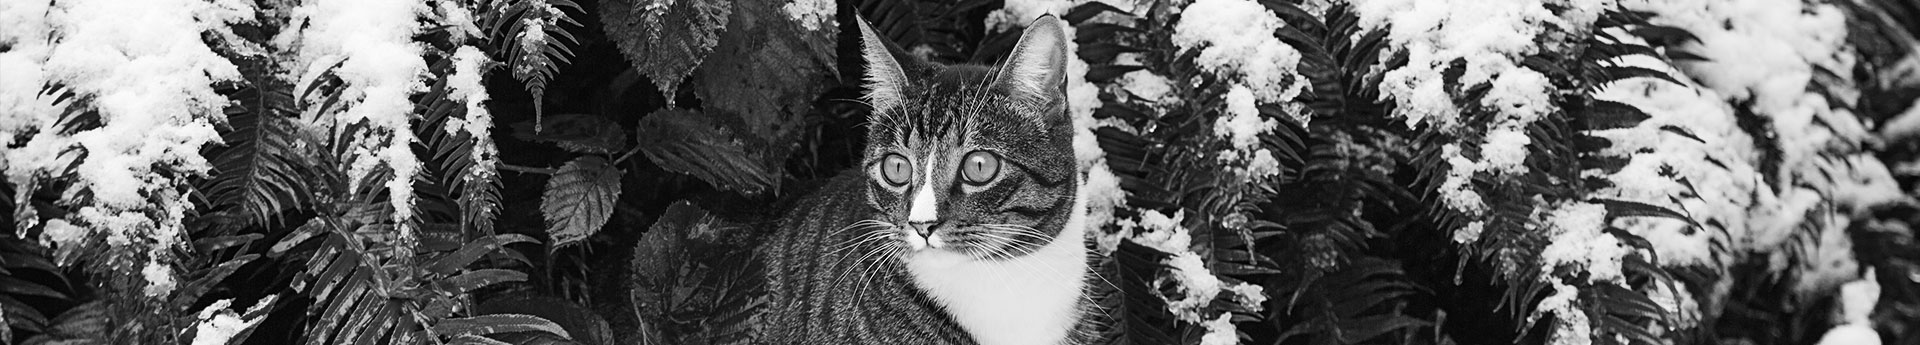 ORIJEN Fit & Trim Dry Cat Food - Wide-eyed cat in snow covered plants - Tyke from Washington